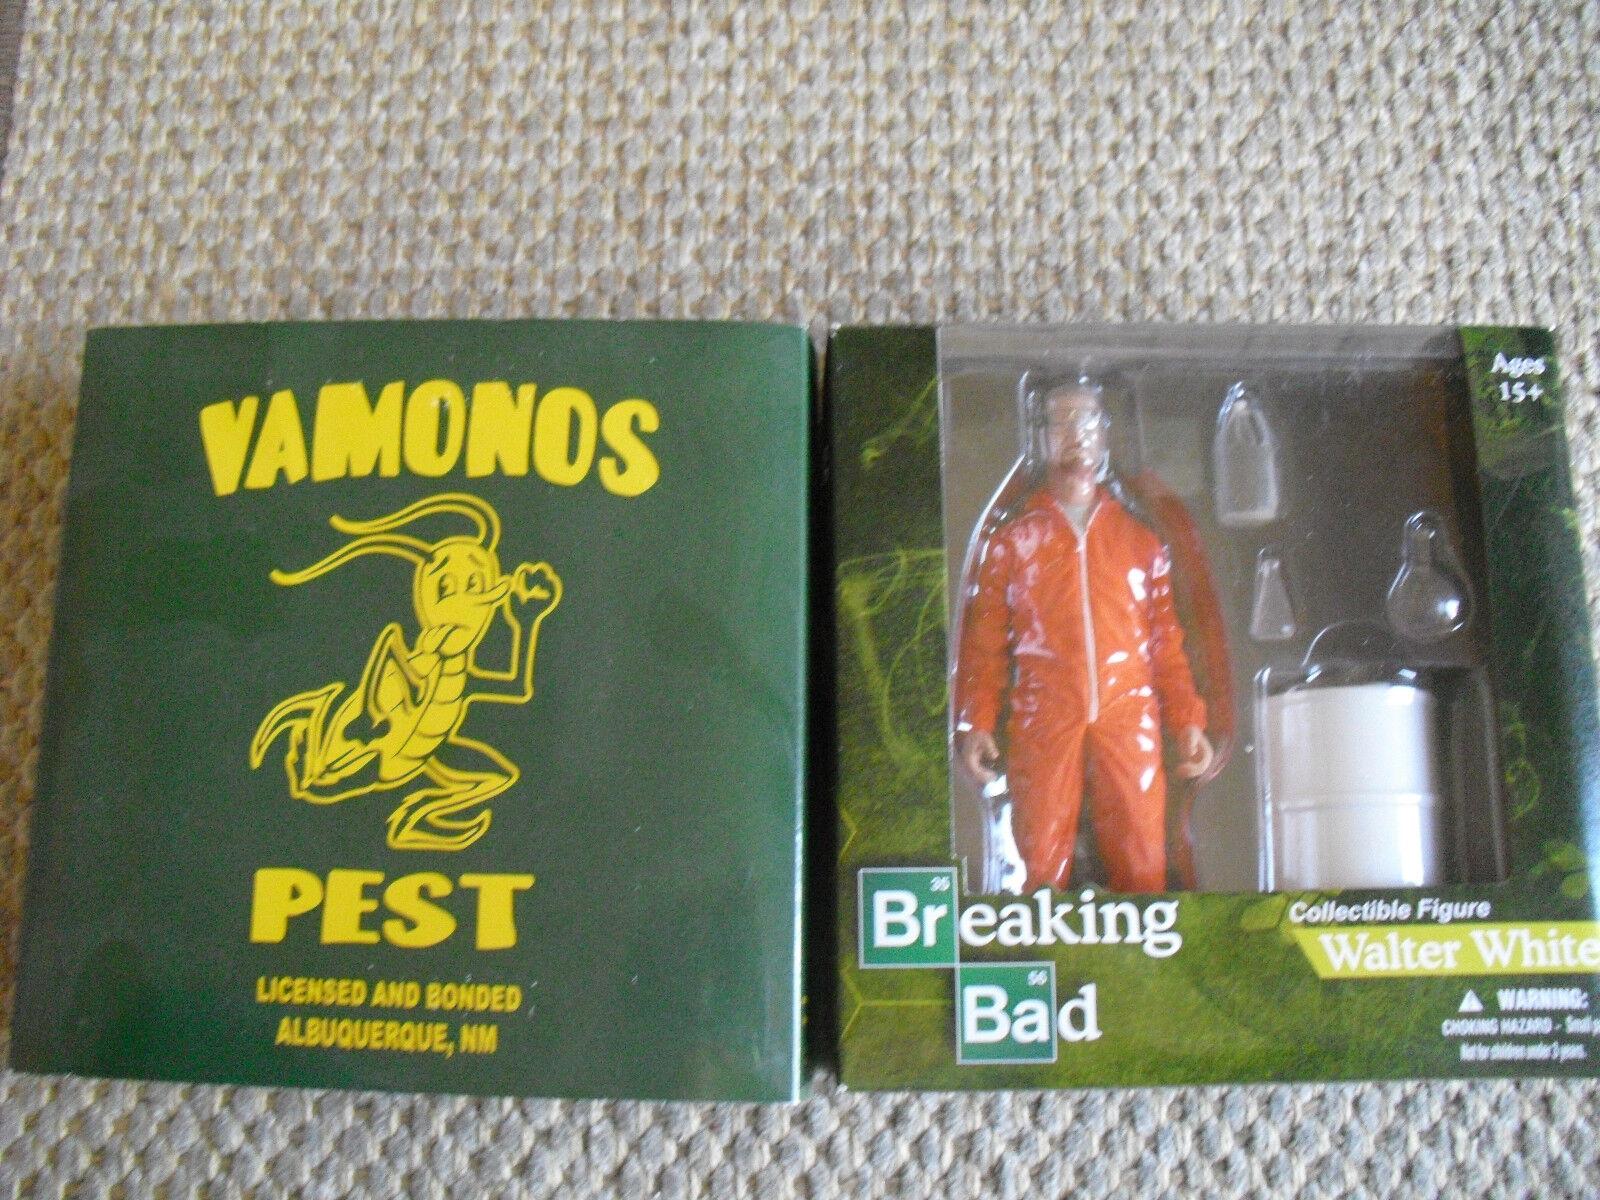 BREAKING BAD - Walter White collectible figure NEW by Vamonos Pest Mezcotoyz